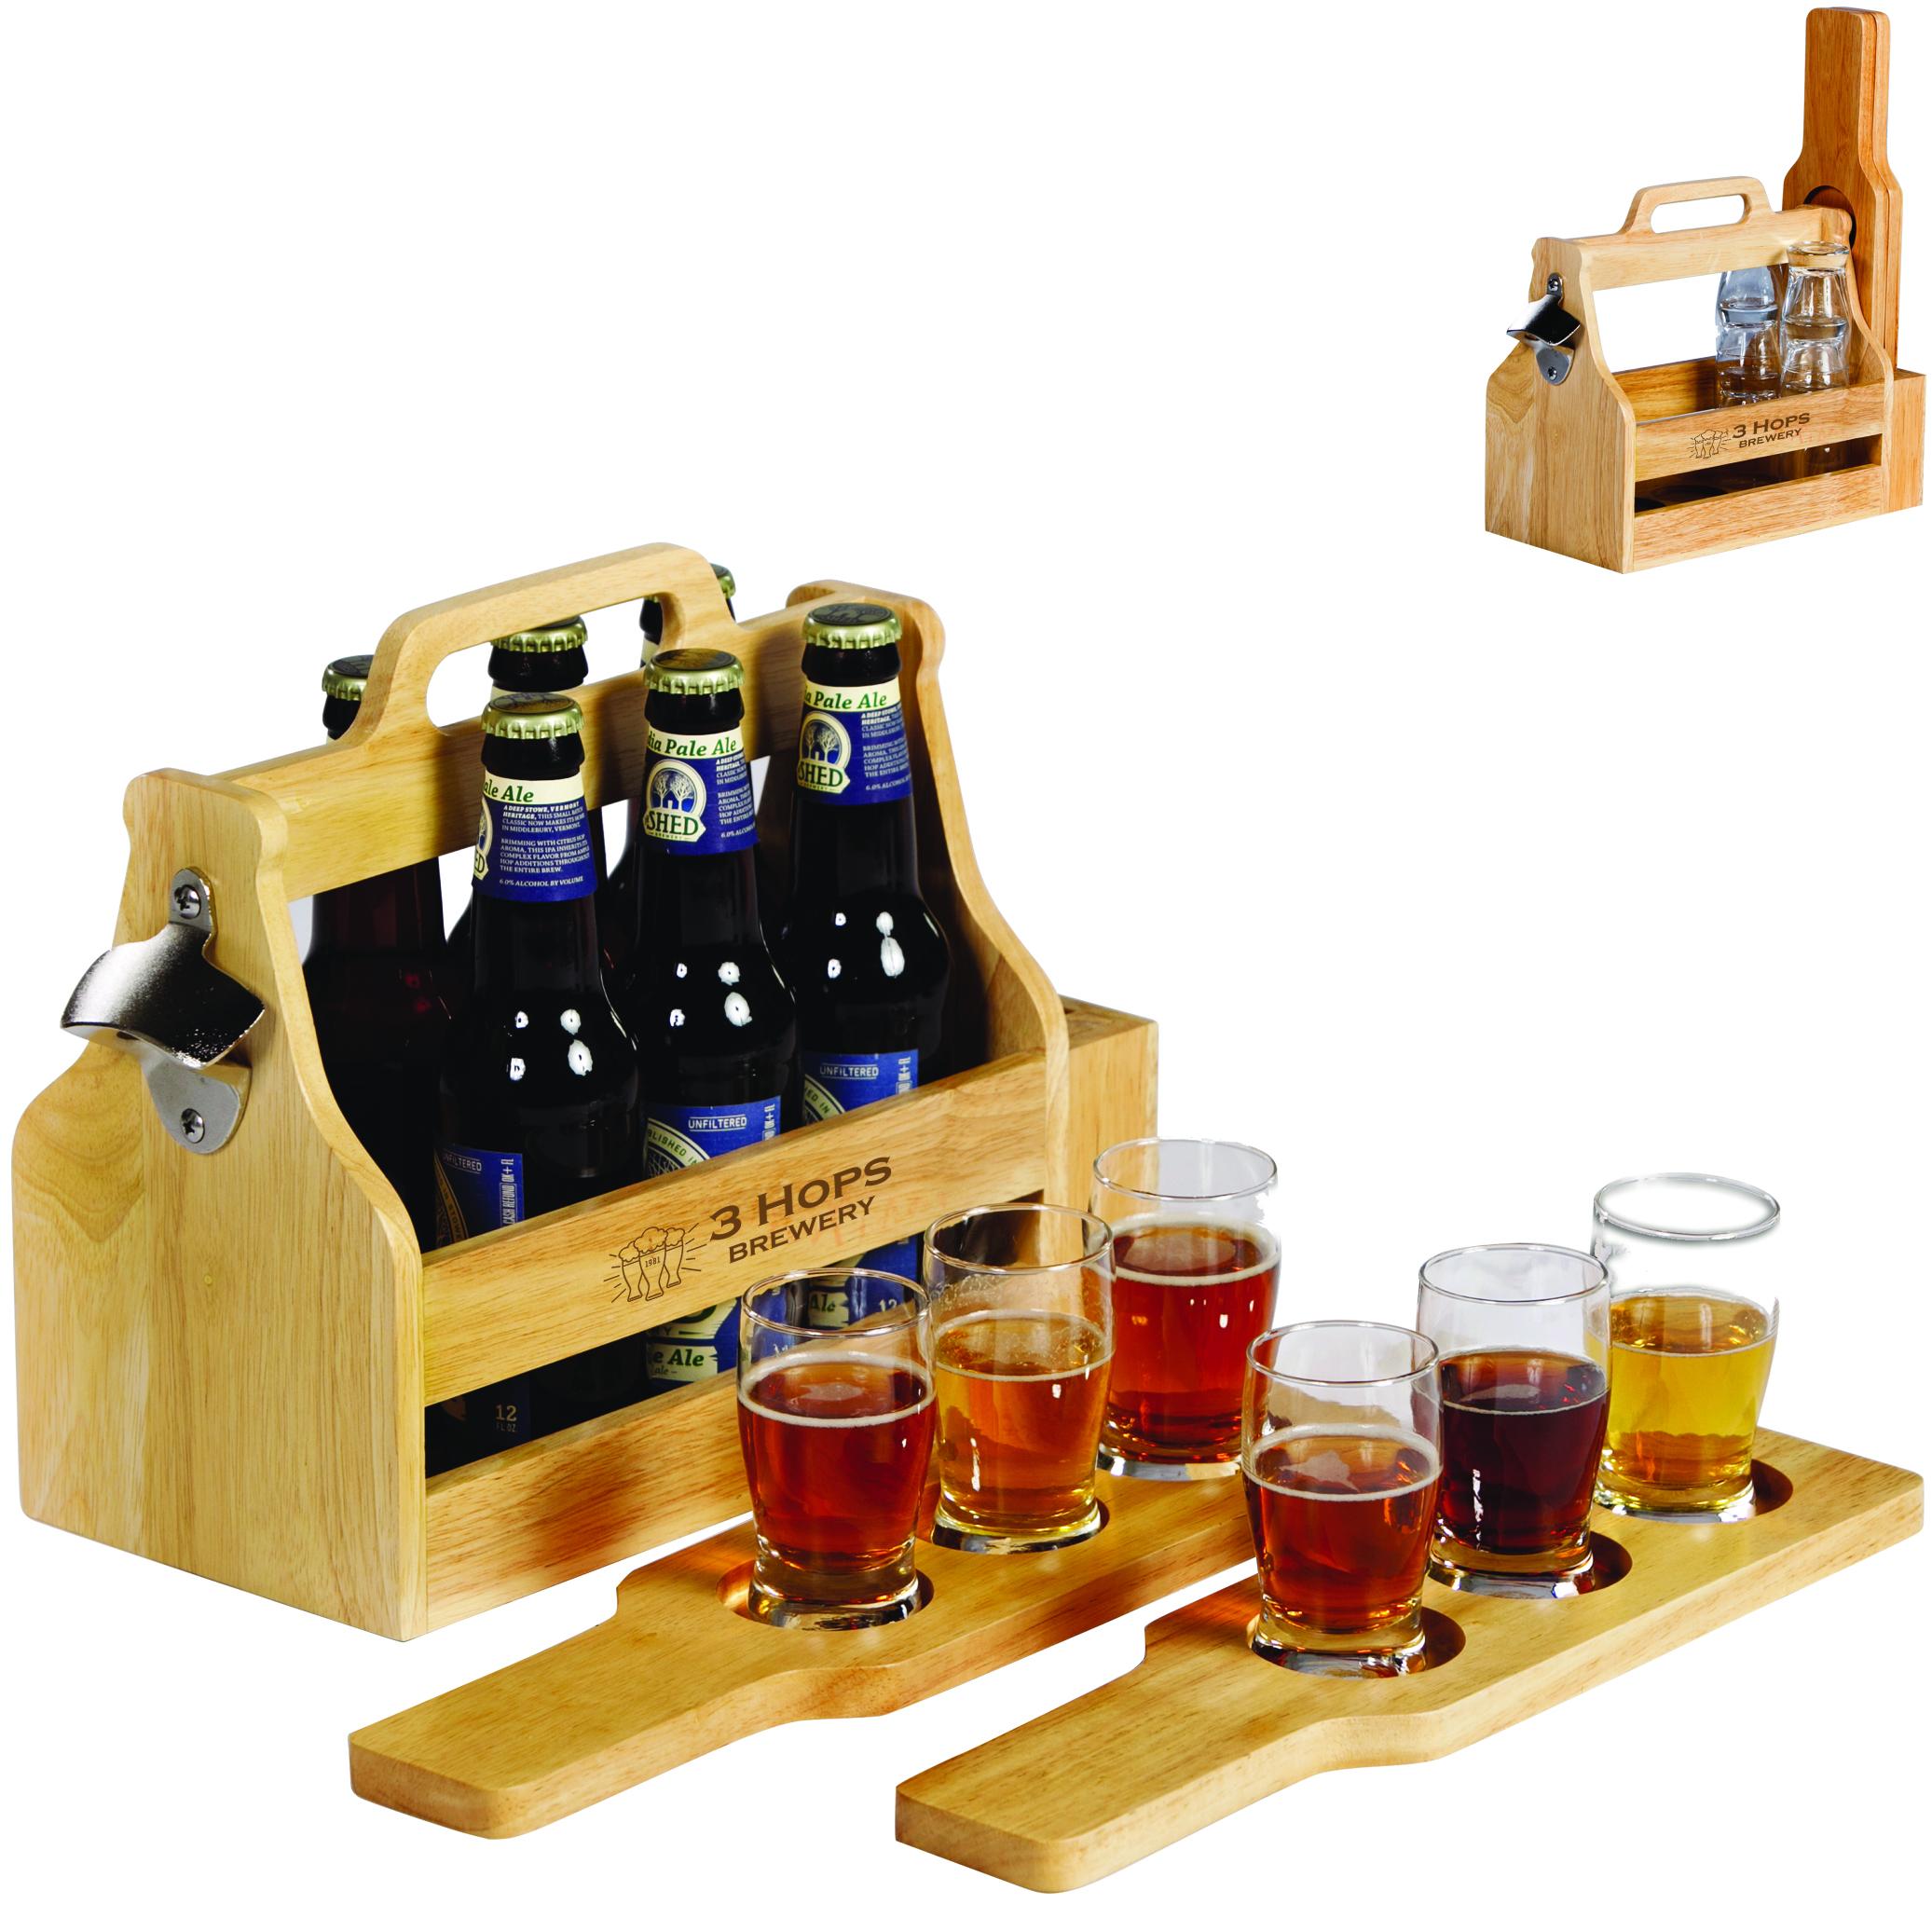 Brewfest Wooden Bottle Carrier & Beer Flight Gift Set